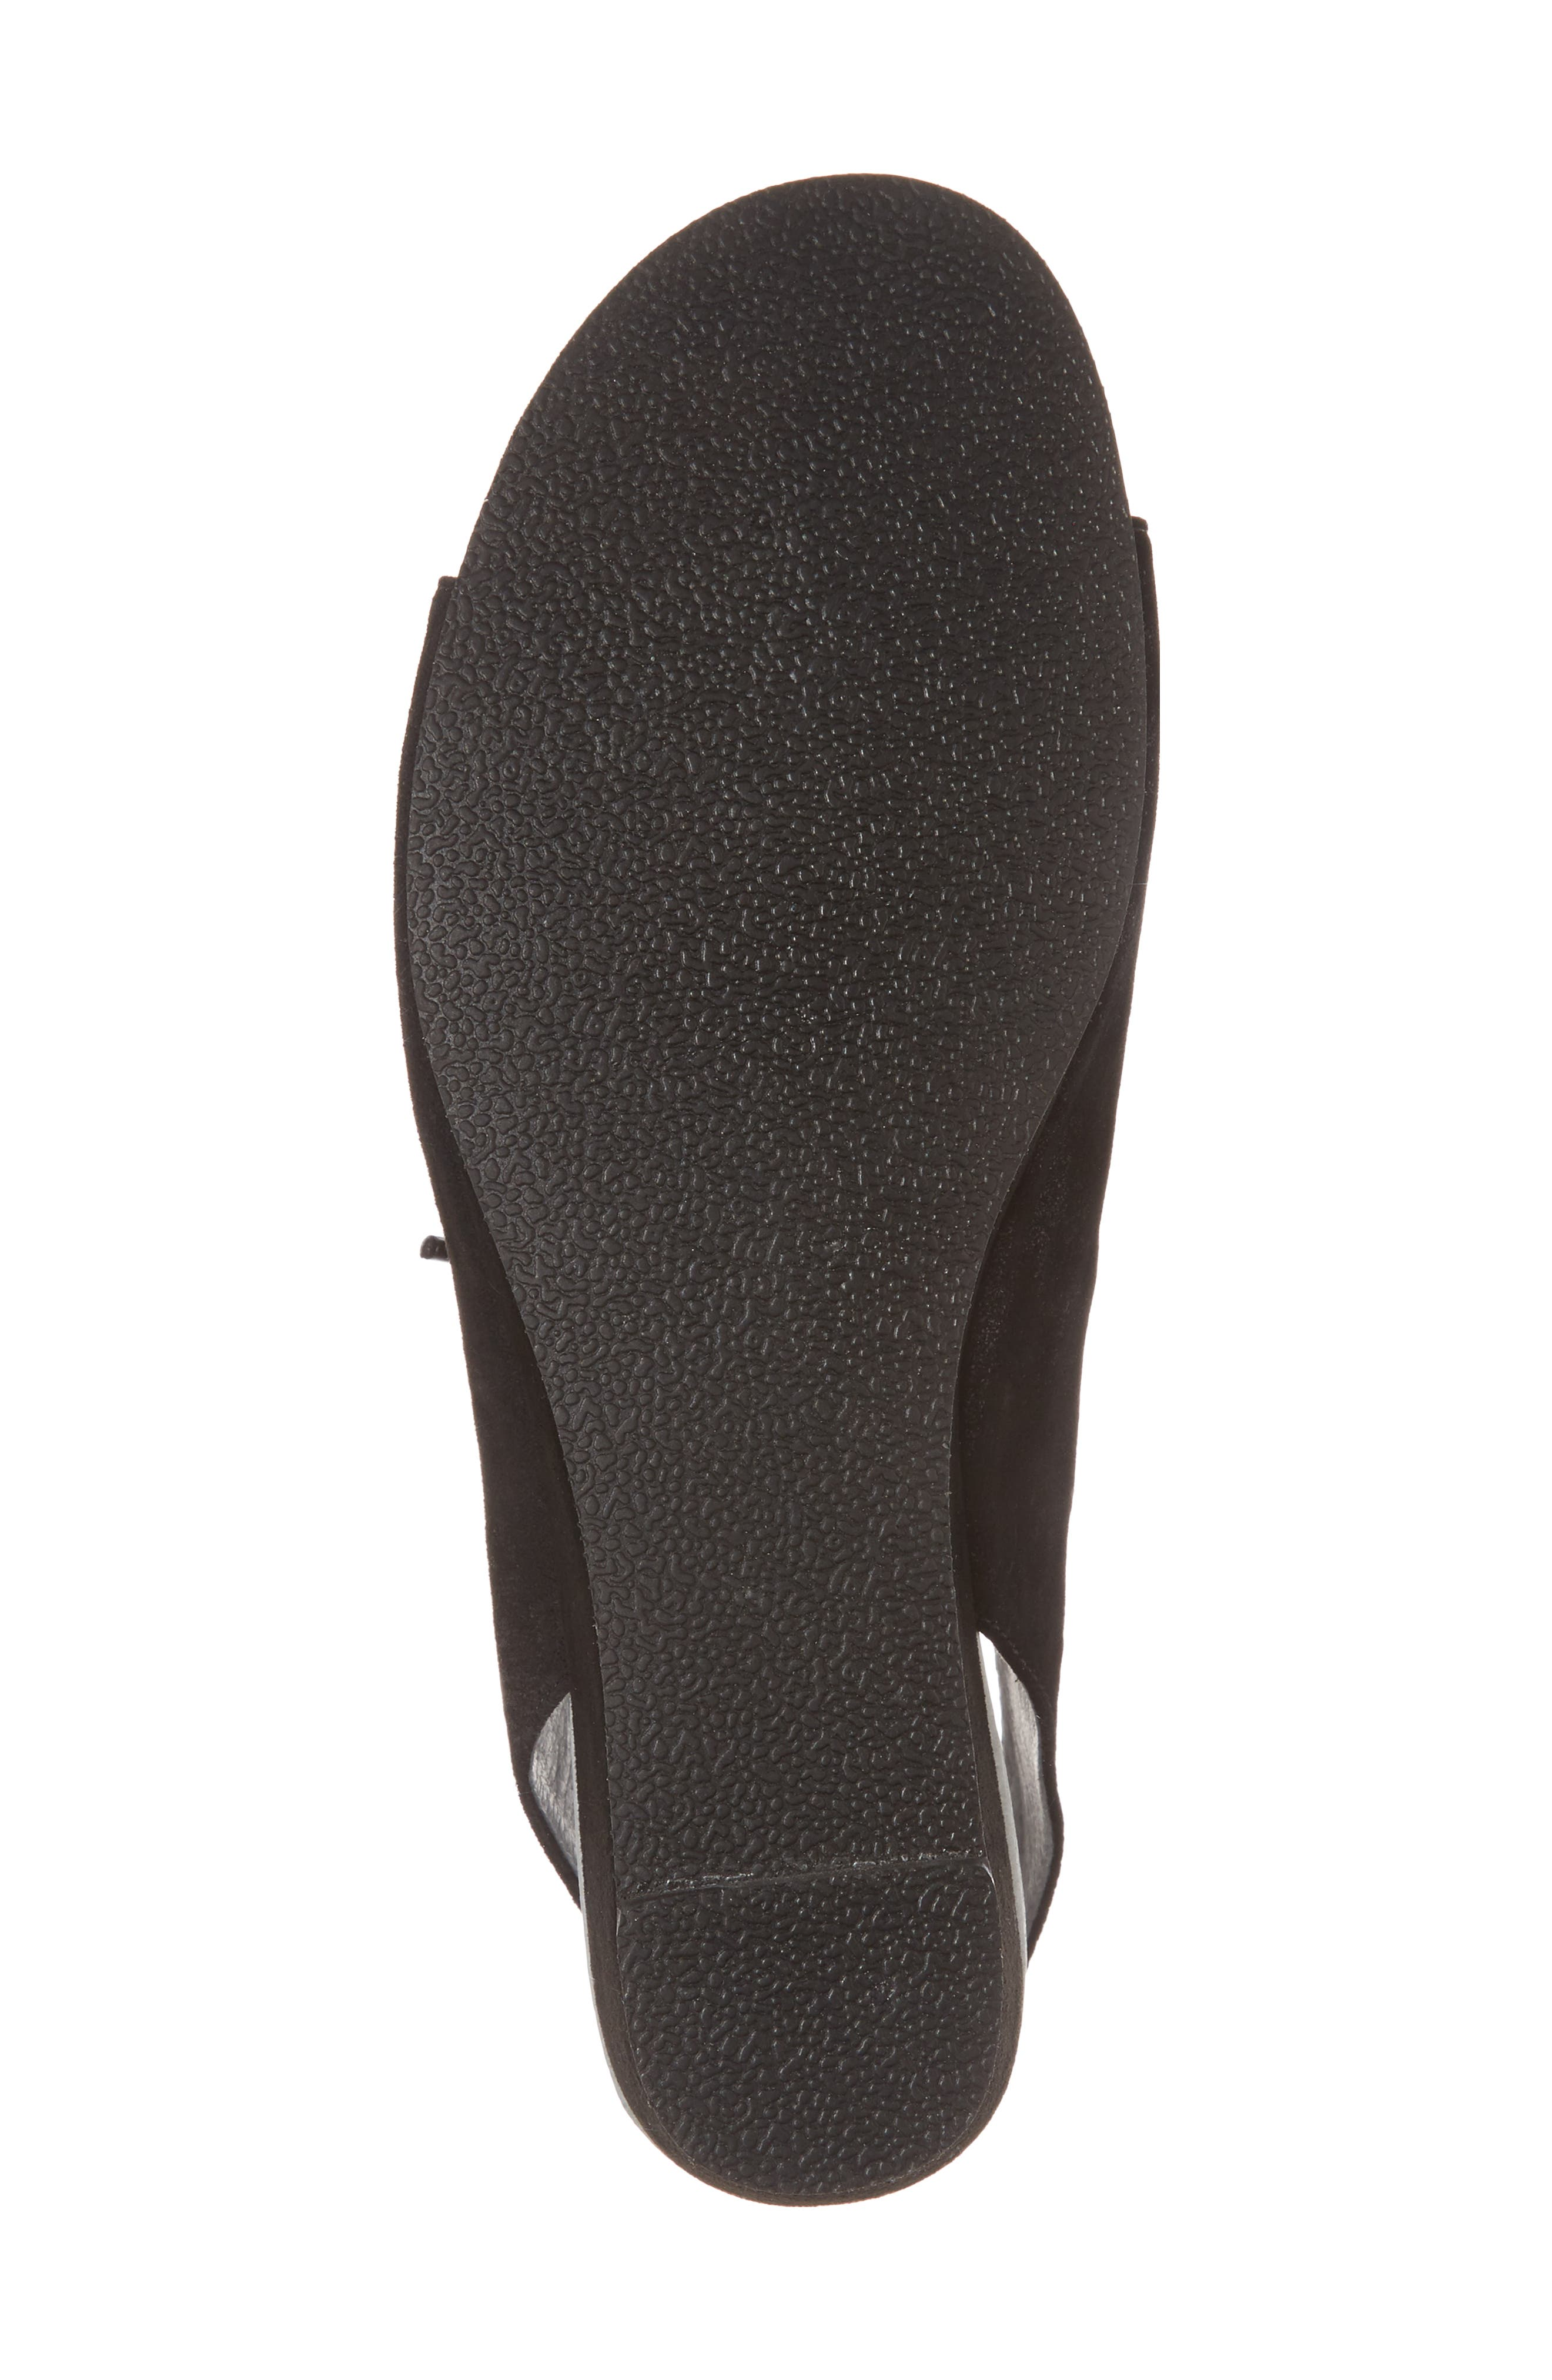 DAVID TATE, Rich Wedge Sandal, Alternate thumbnail 6, color, BLACK SUEDE